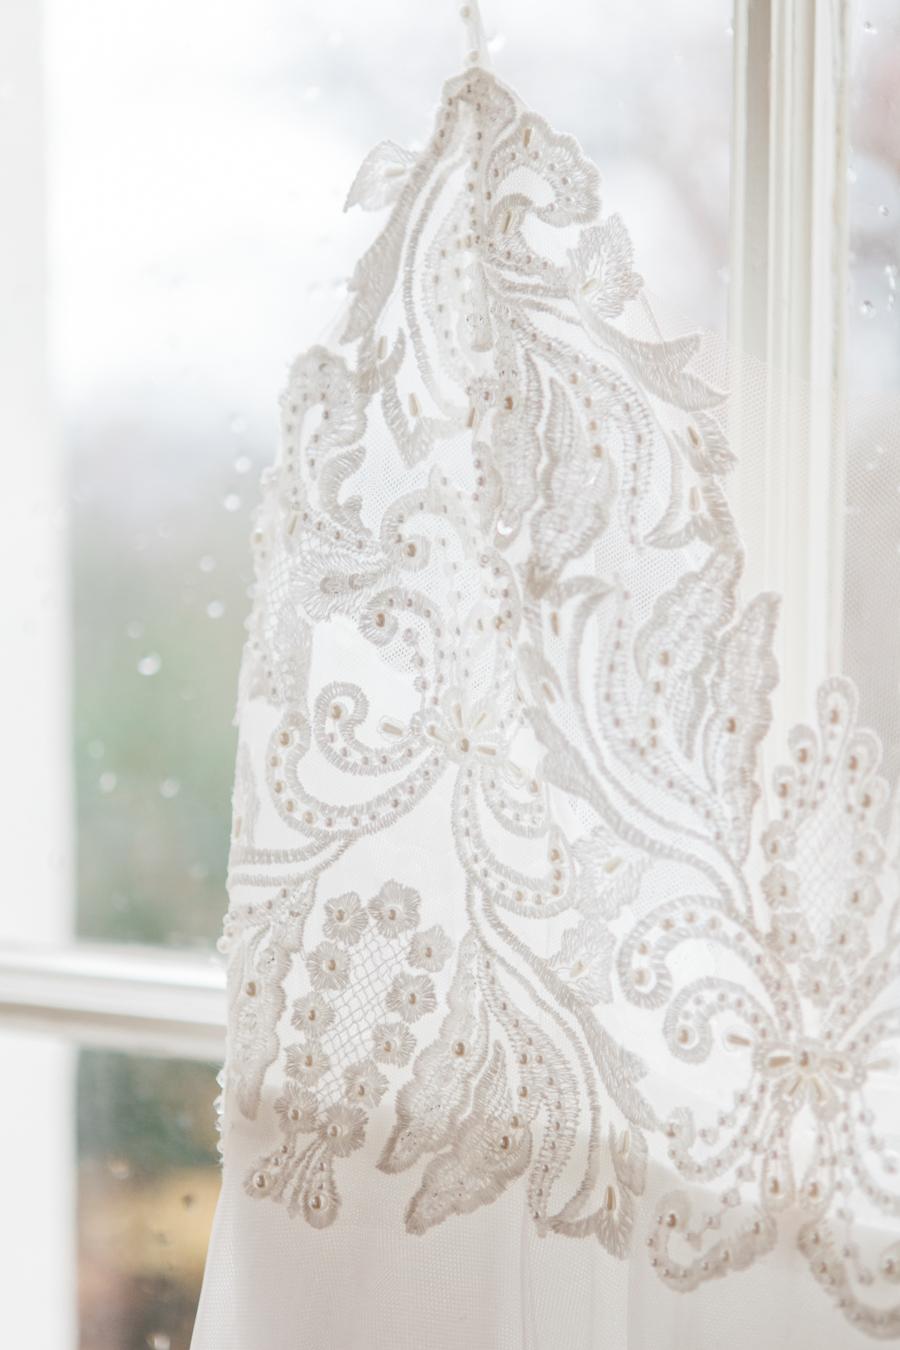 Starry celestial wedding inspiration (with a sprinkling of Disney magic) - Amanda Karen Photography (2)